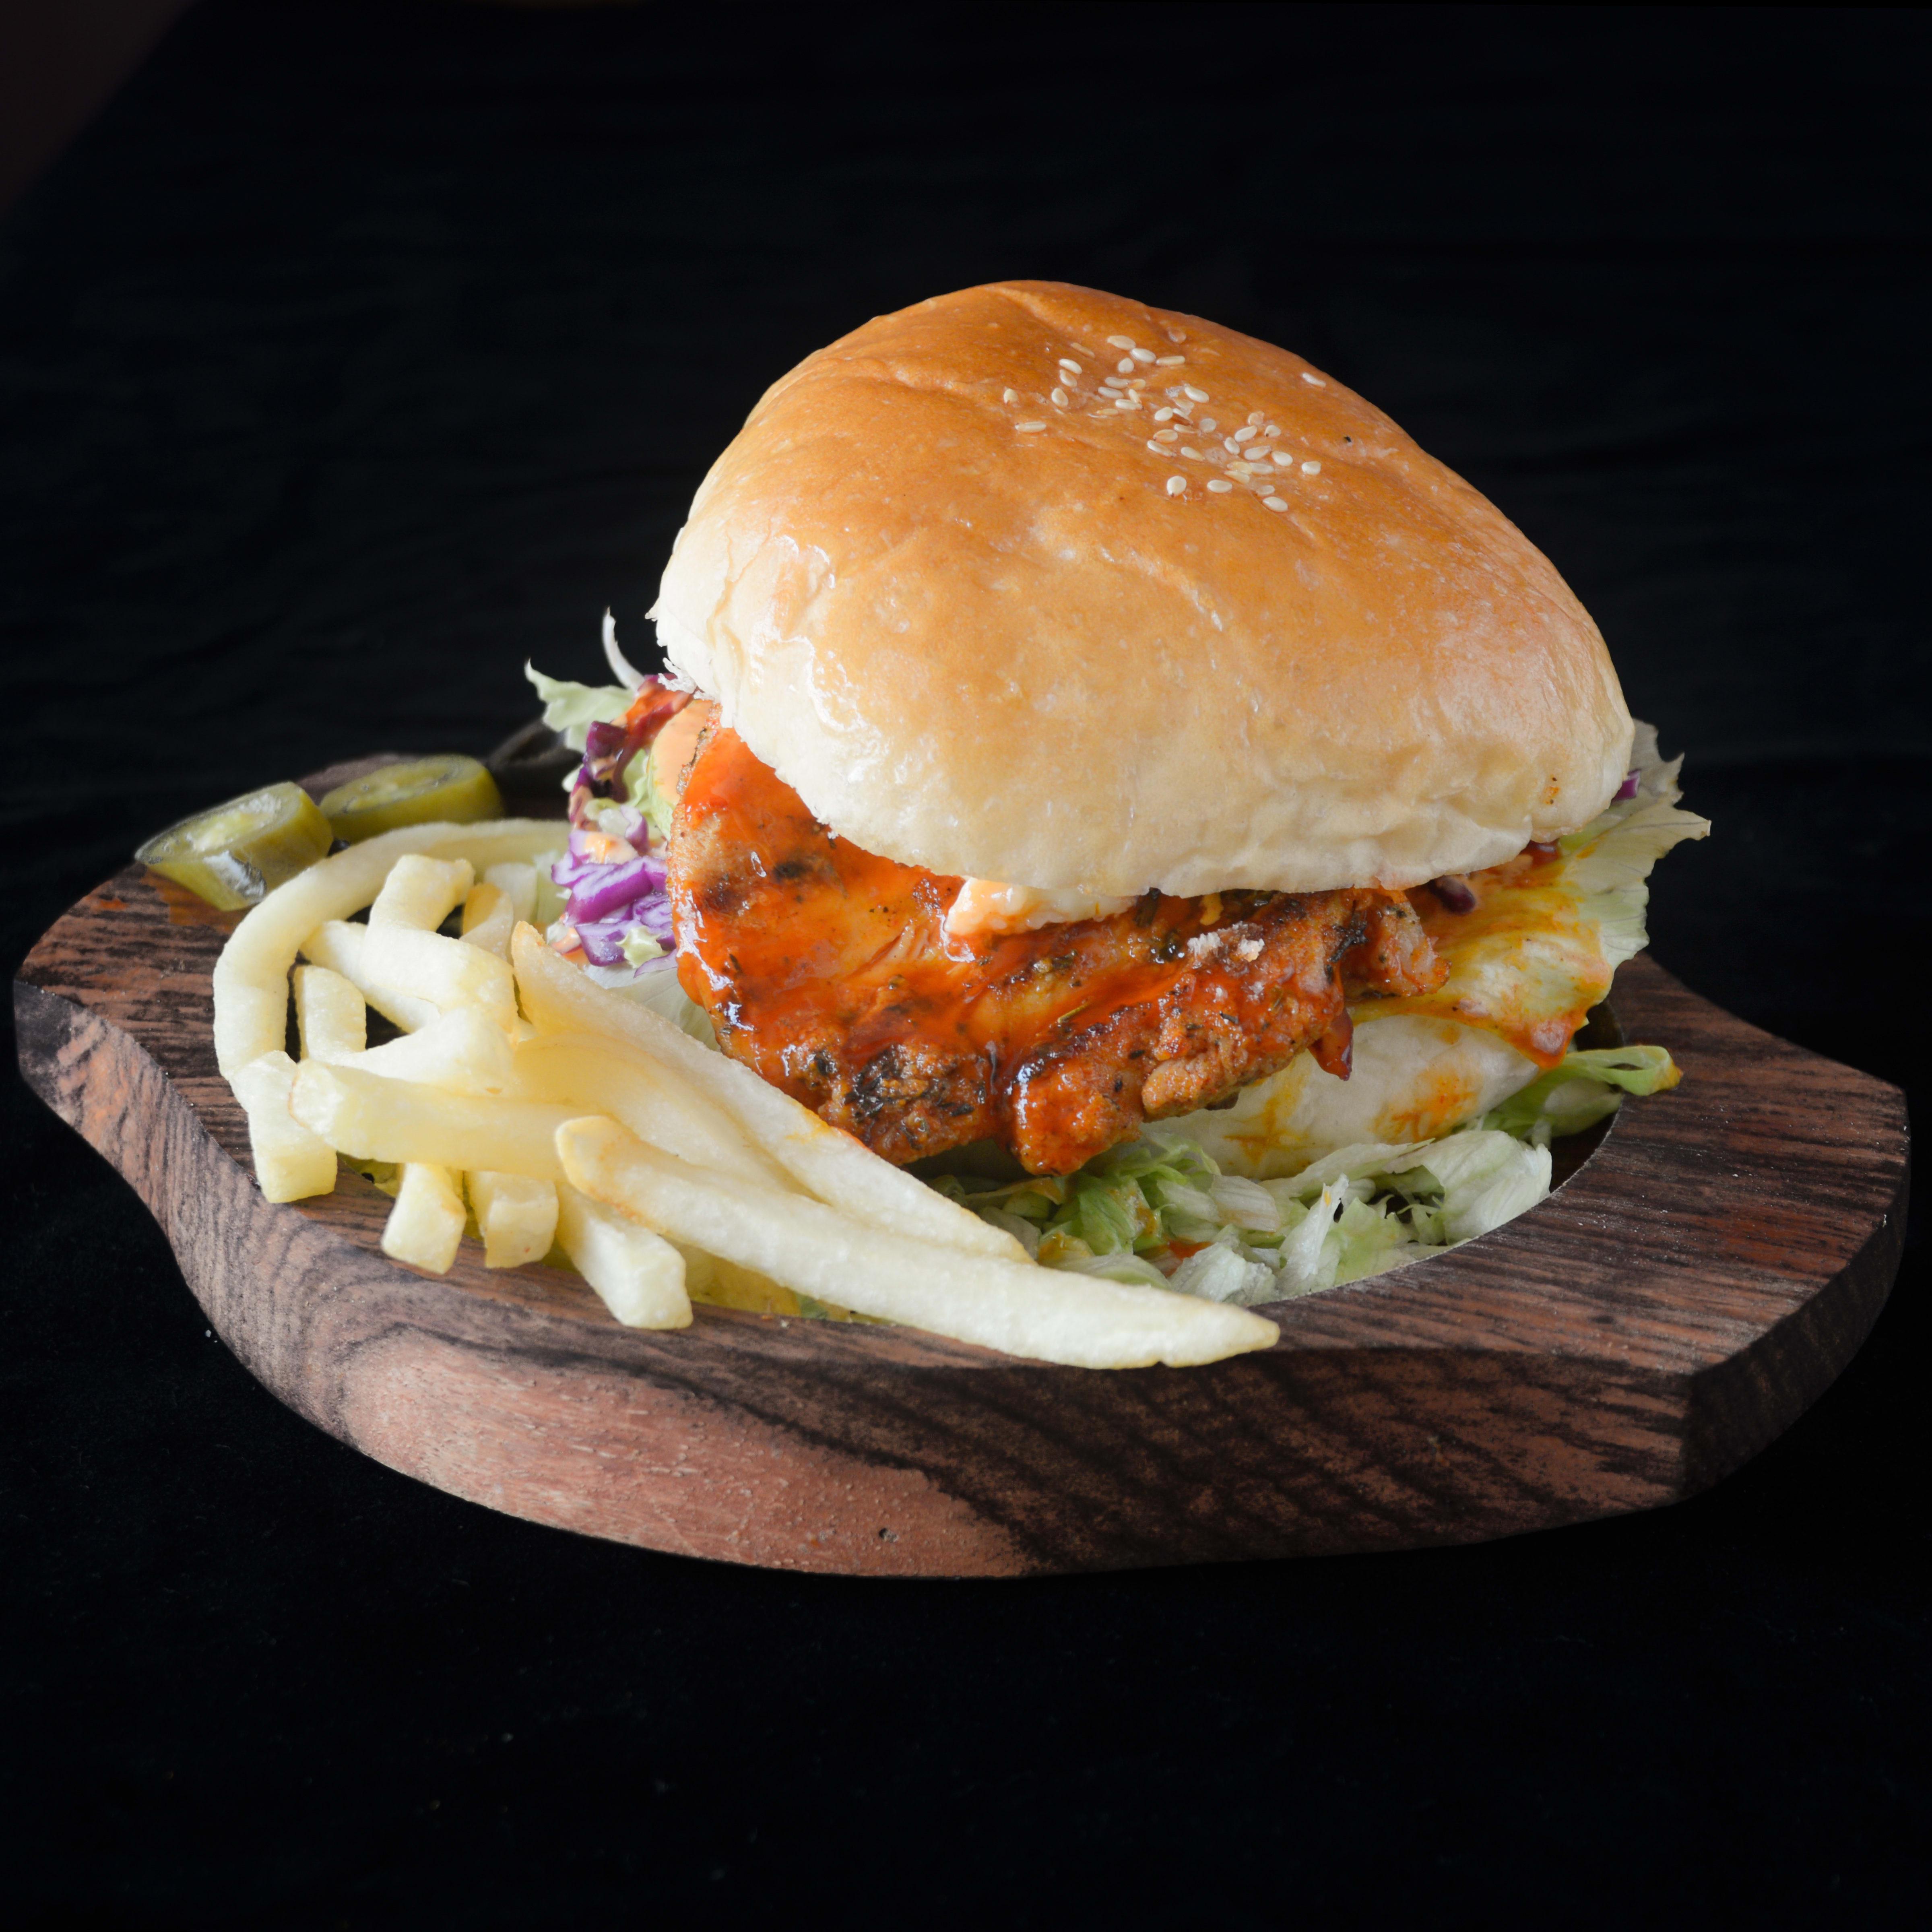 Burger Hut | Home delivery | Order online | MG Road MG Road Kochi